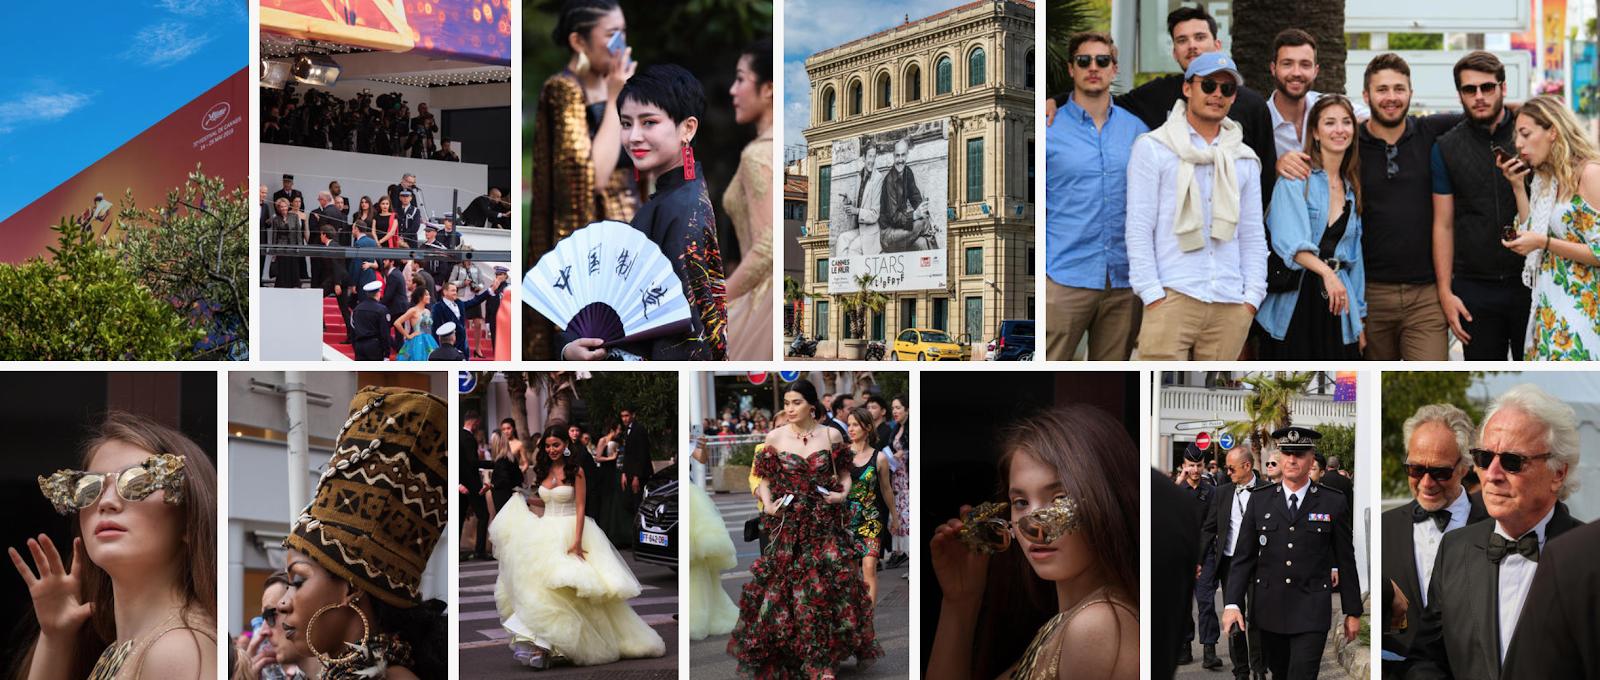 72e Festival de Cannes 2019